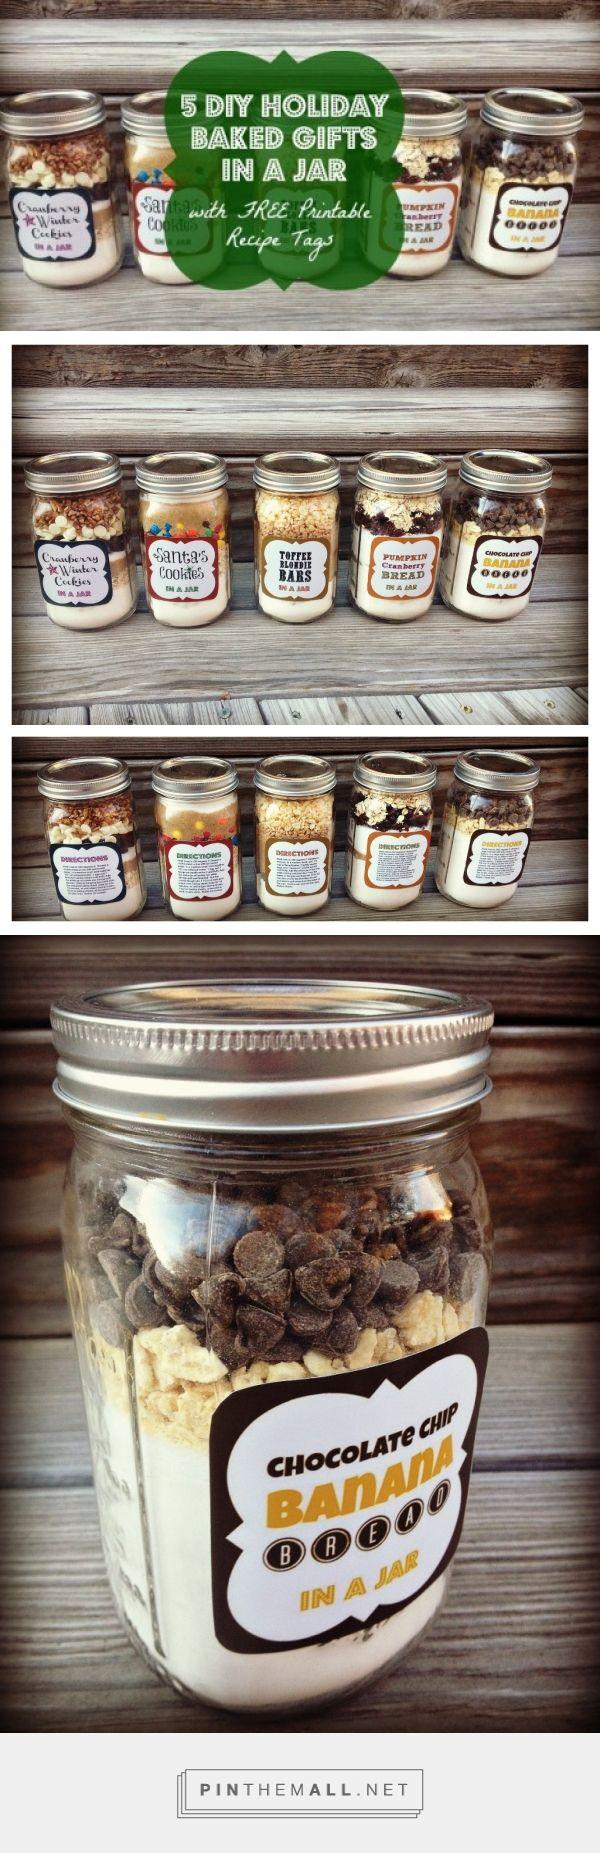 Holiday Baked Gifts | Barattoli riciclati di ricette con ingredienti scomposti per dolci... Via culdesaccool.com #FarmersXmasGifts #Christmas #Gift #Handmade #Homemade #Diy #Food